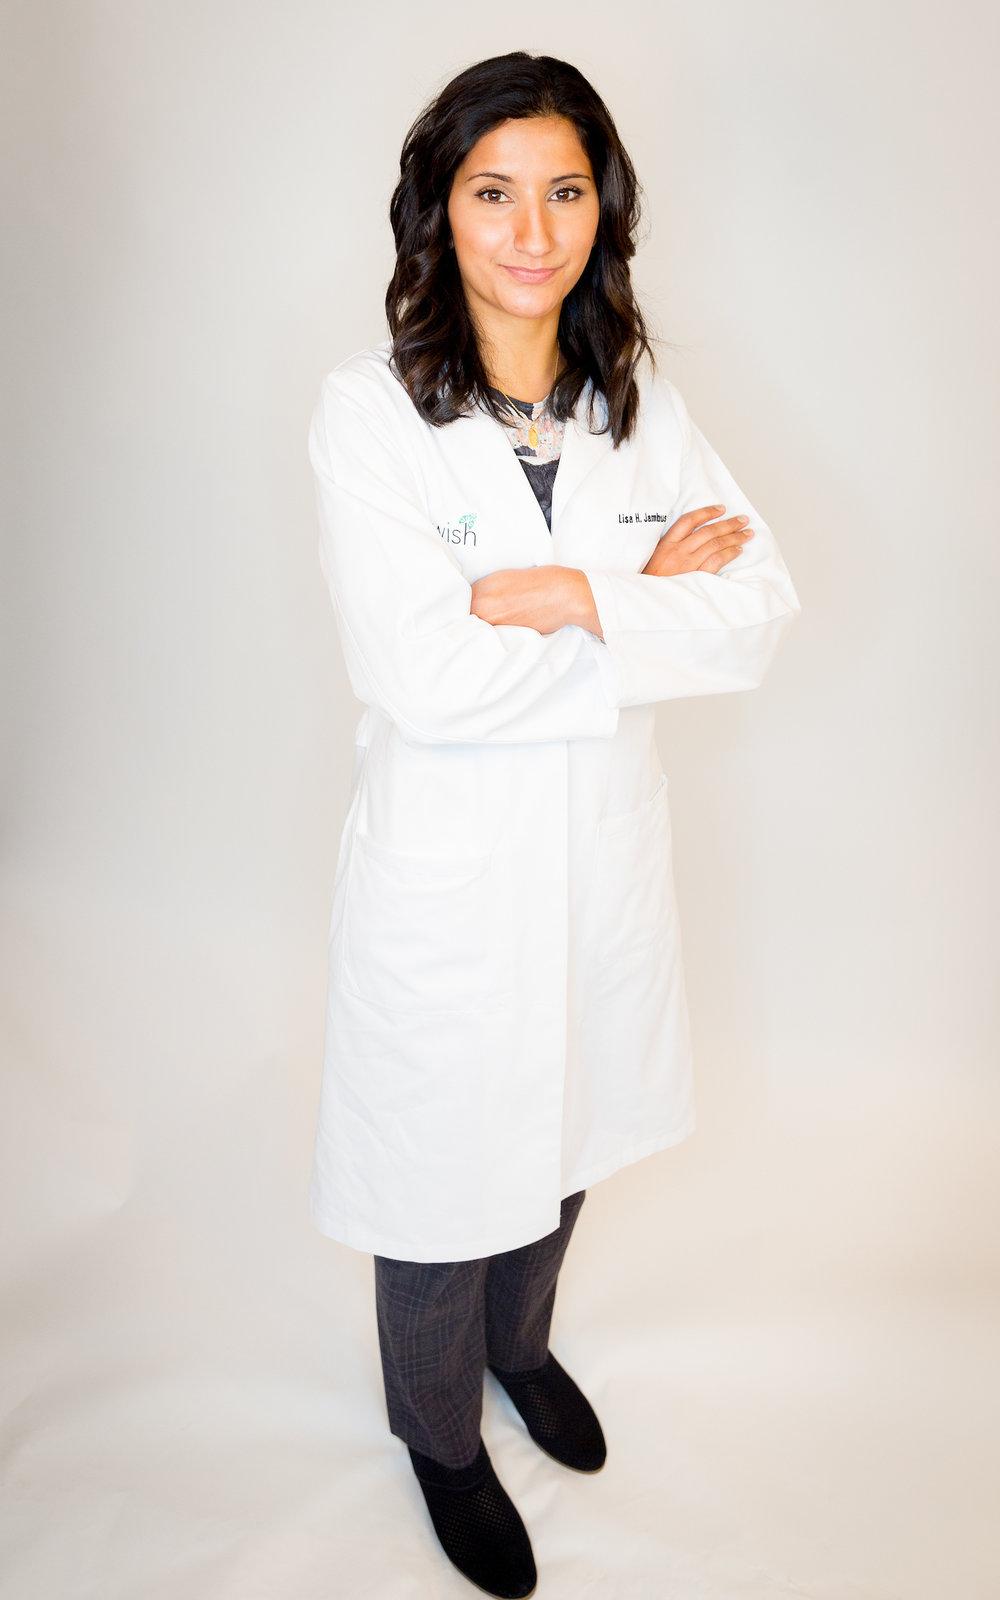 Lisa Jambusaria, M.D., FPMRS